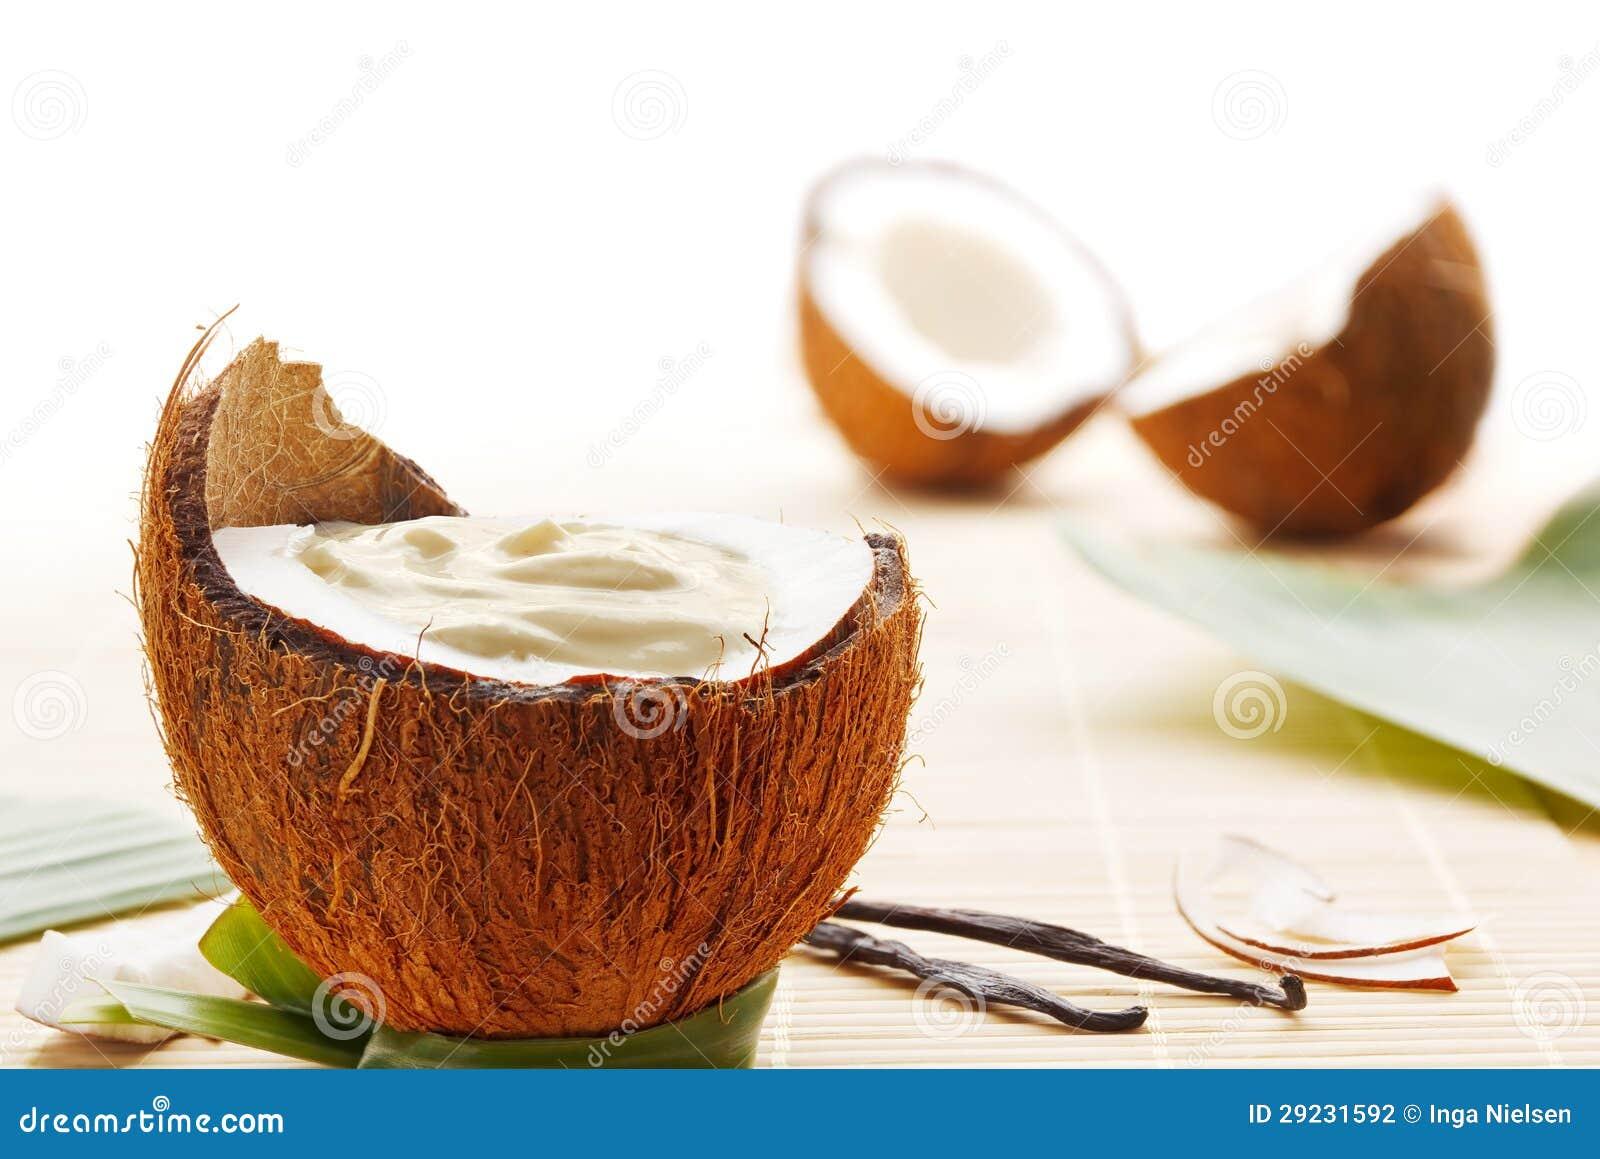 Download Musse do coco foto de stock. Imagem de dessert, ninguém - 29231592